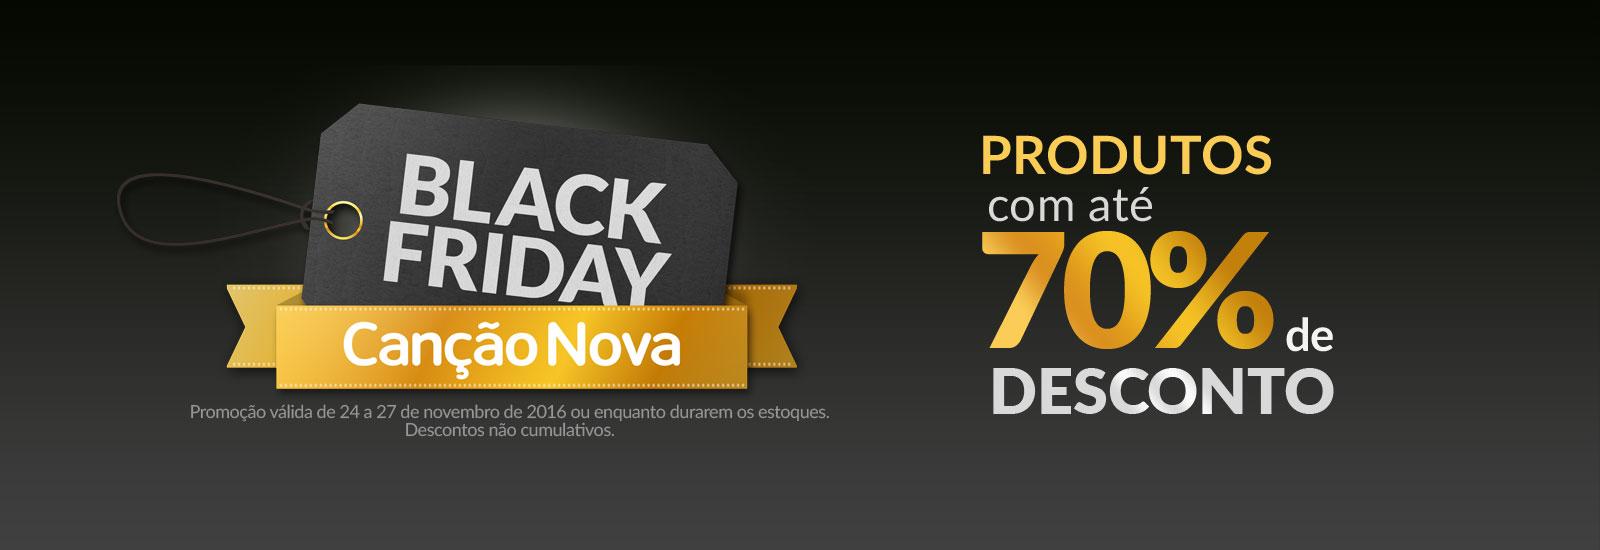 1600x550_blackf_principal